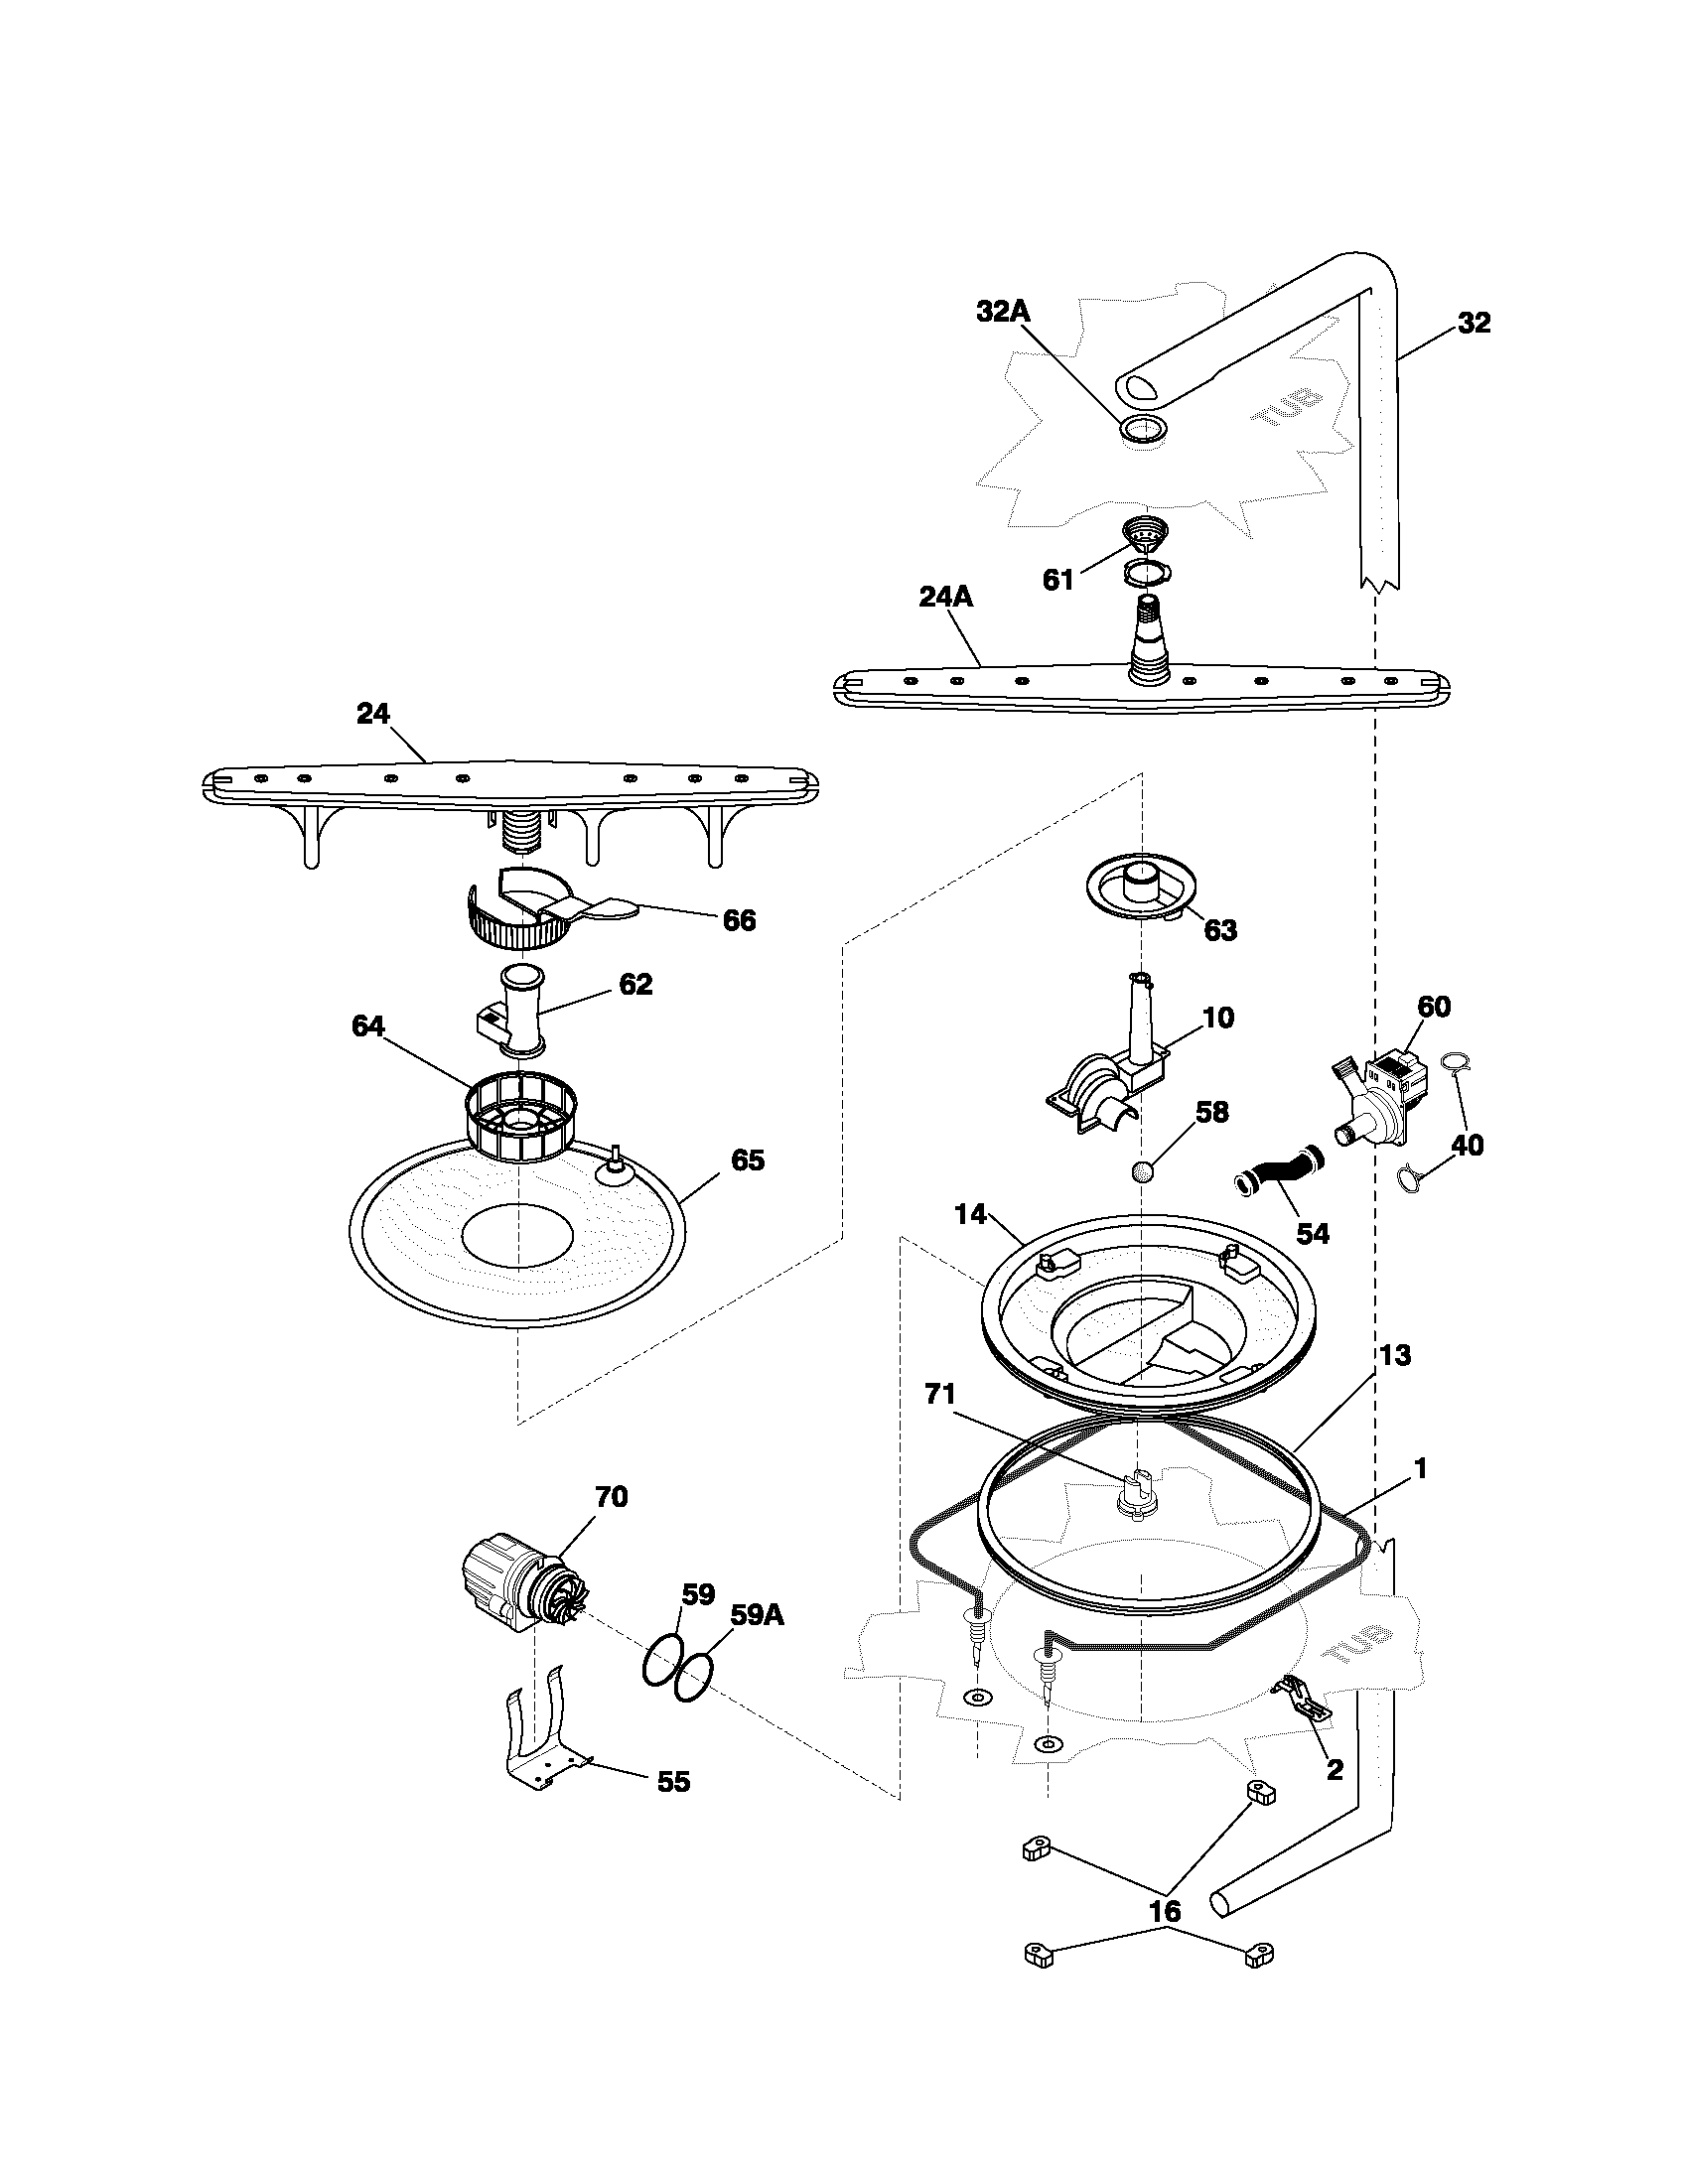 Frigidaire model PLDB998CC0 dishwasher genuine parts